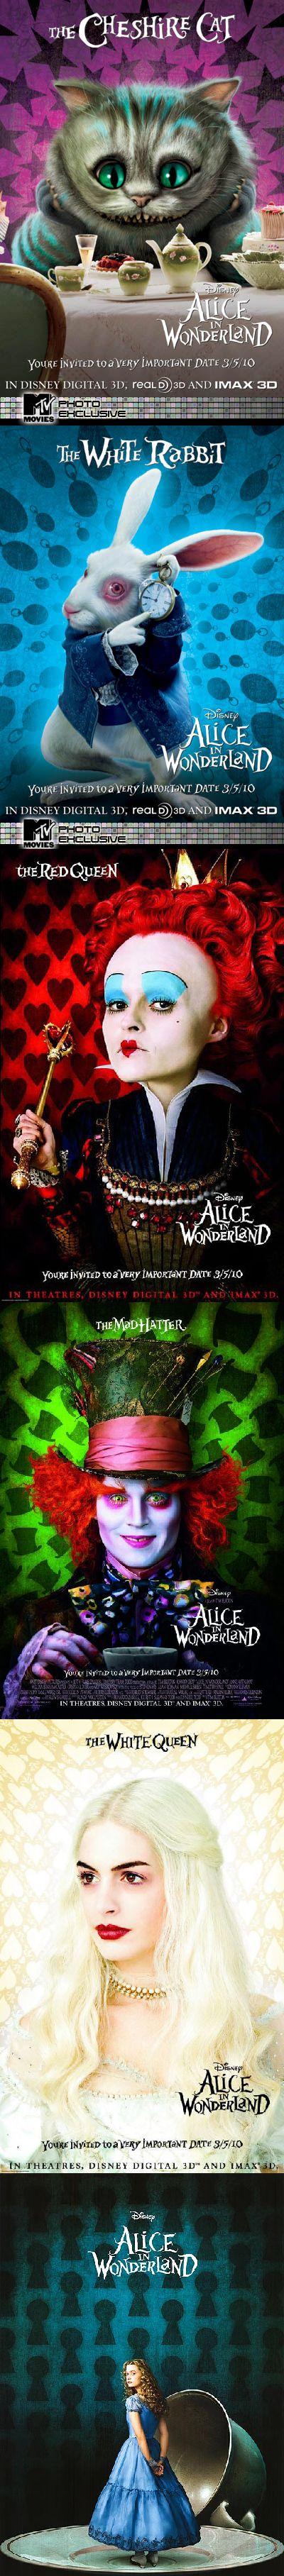 Alice In Wonderland - Tim Burton Style